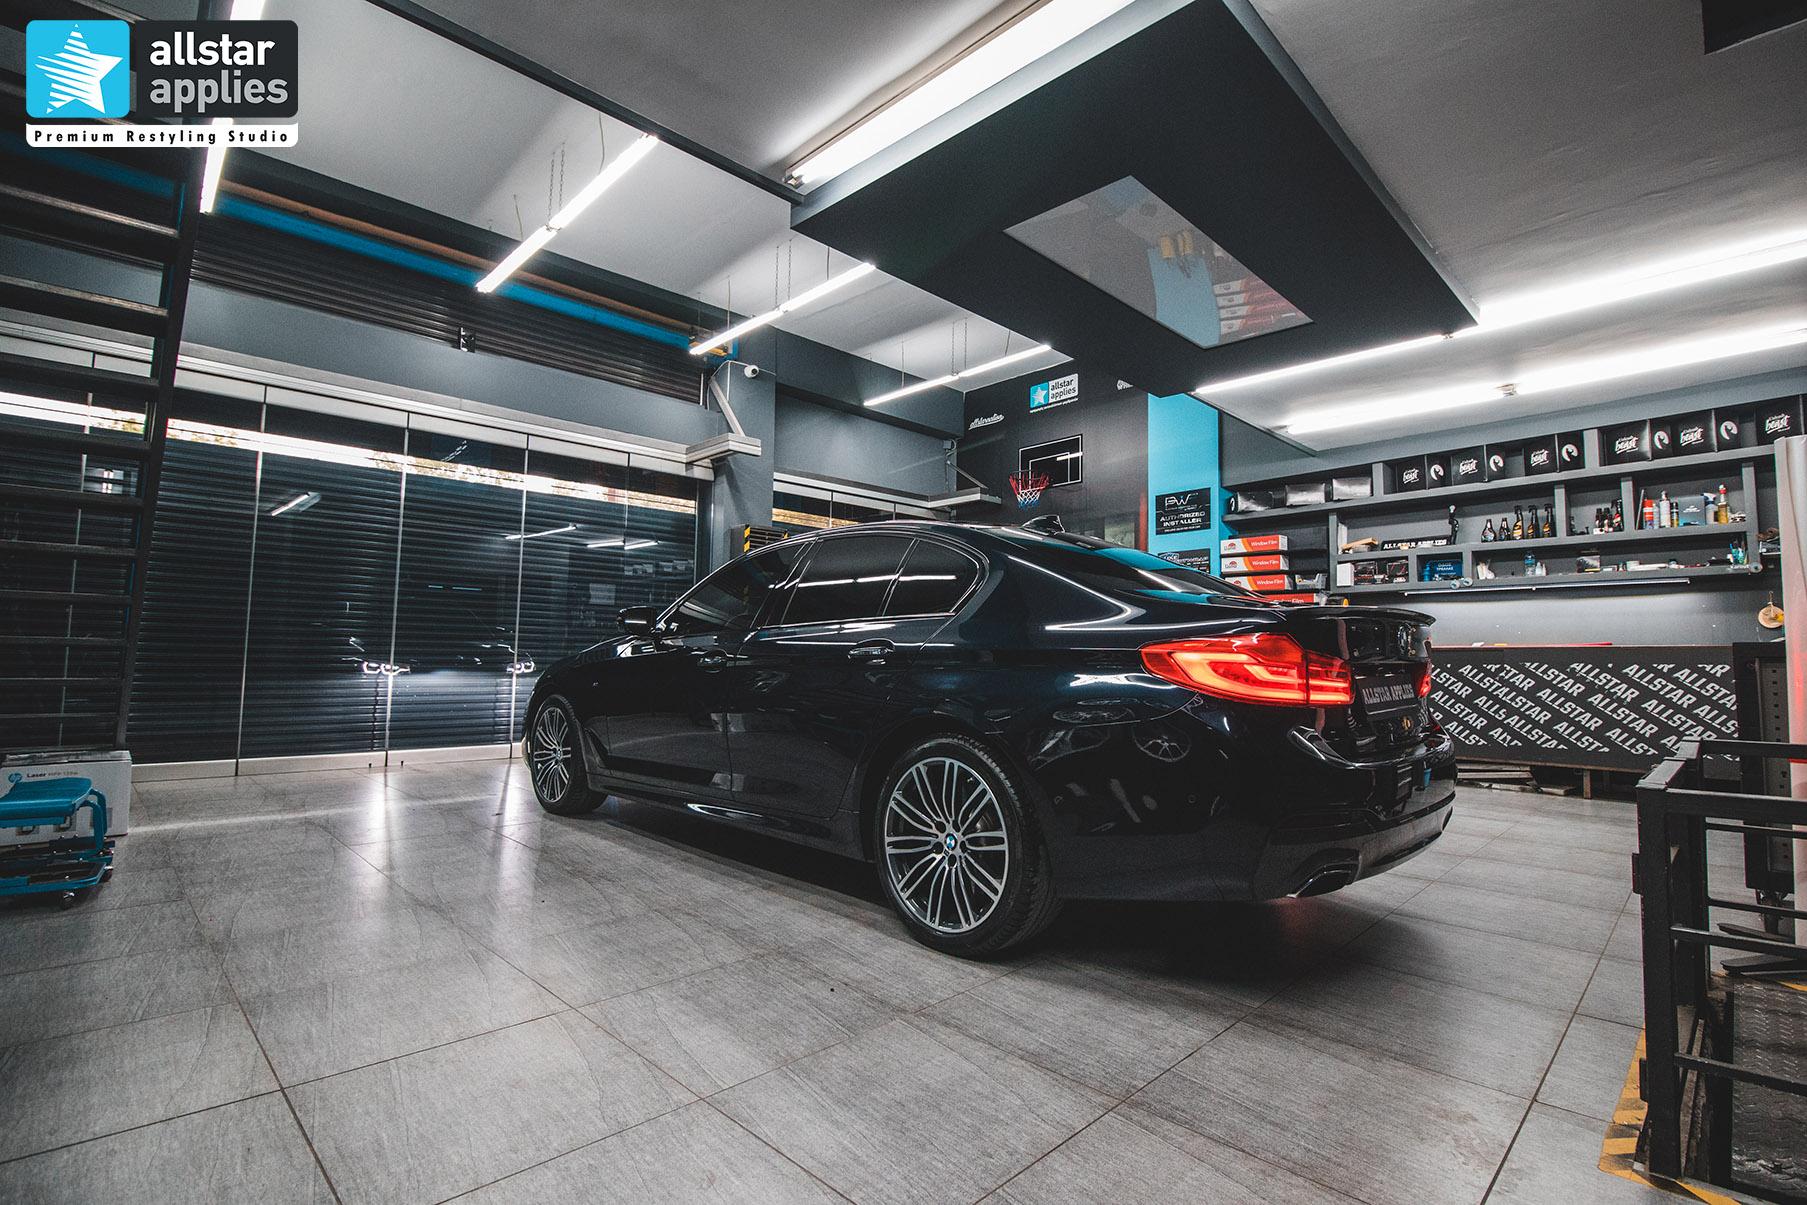 BMW G30 5 SERIES M ALLSTAR APPLIES PPF 6